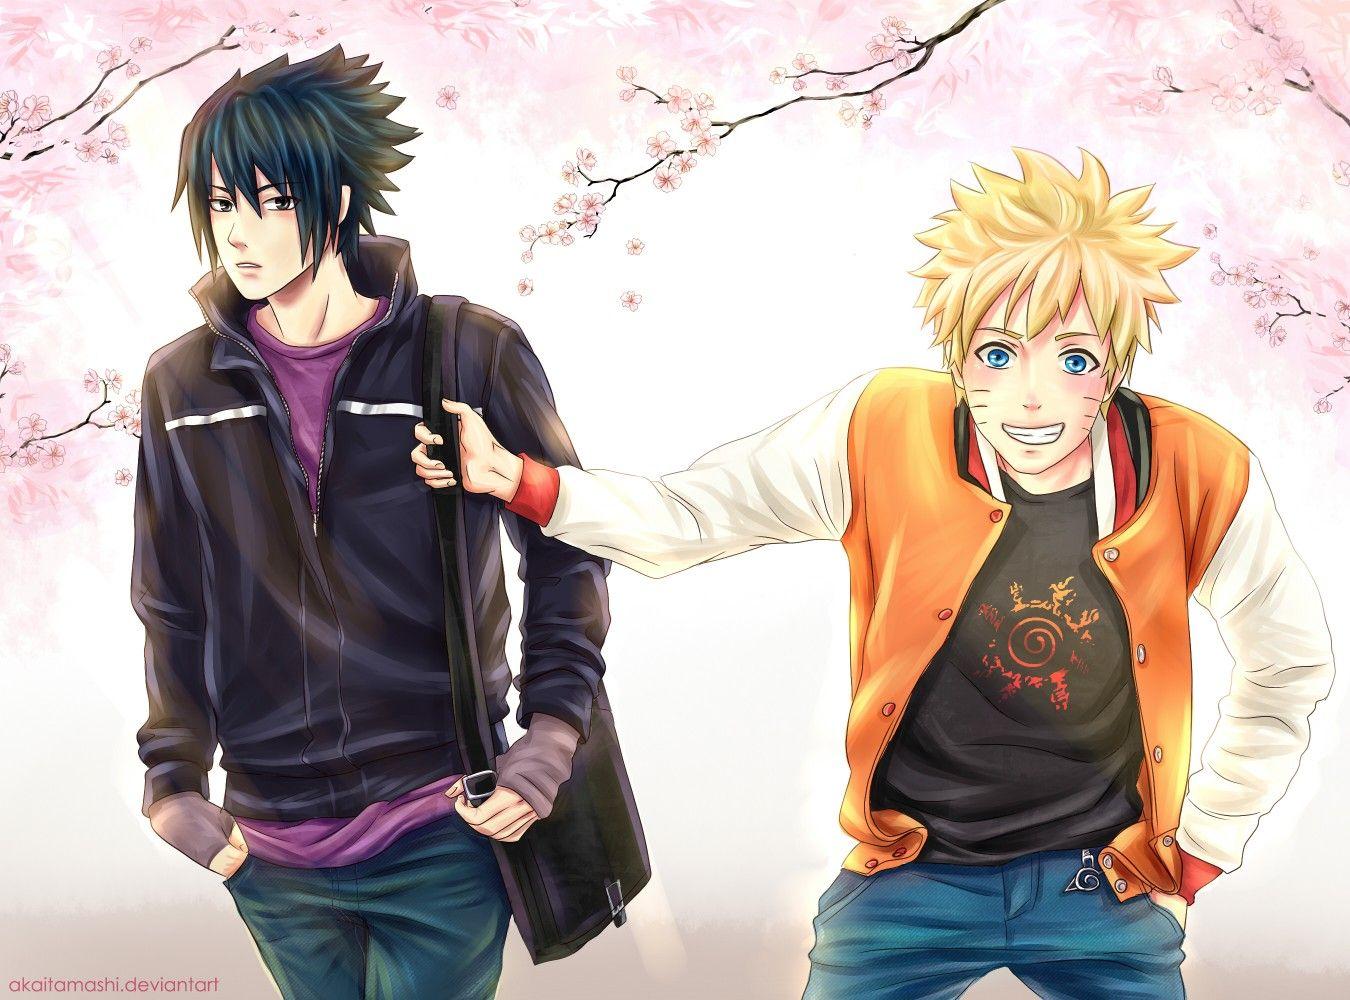 Back To SchoolNaruto And Sasuke Friends Forever